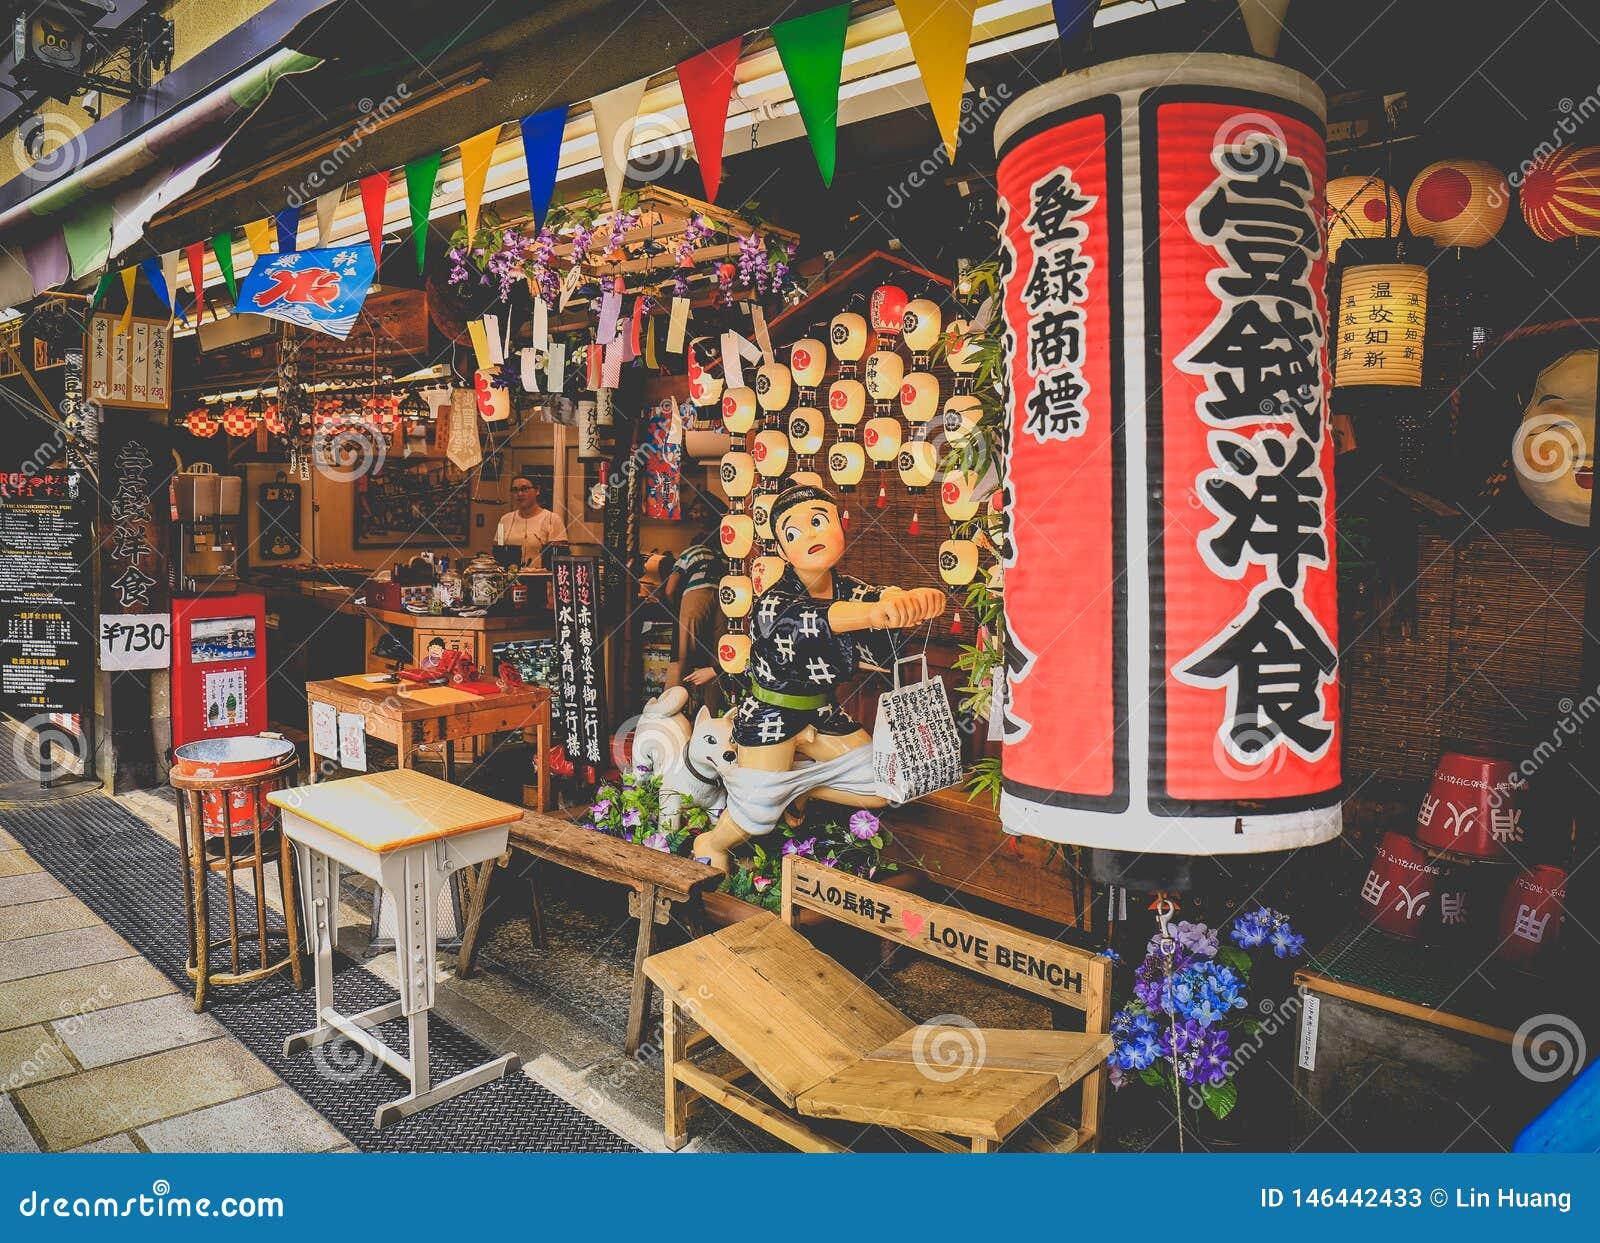 Japanese street,interestingand elegant street.